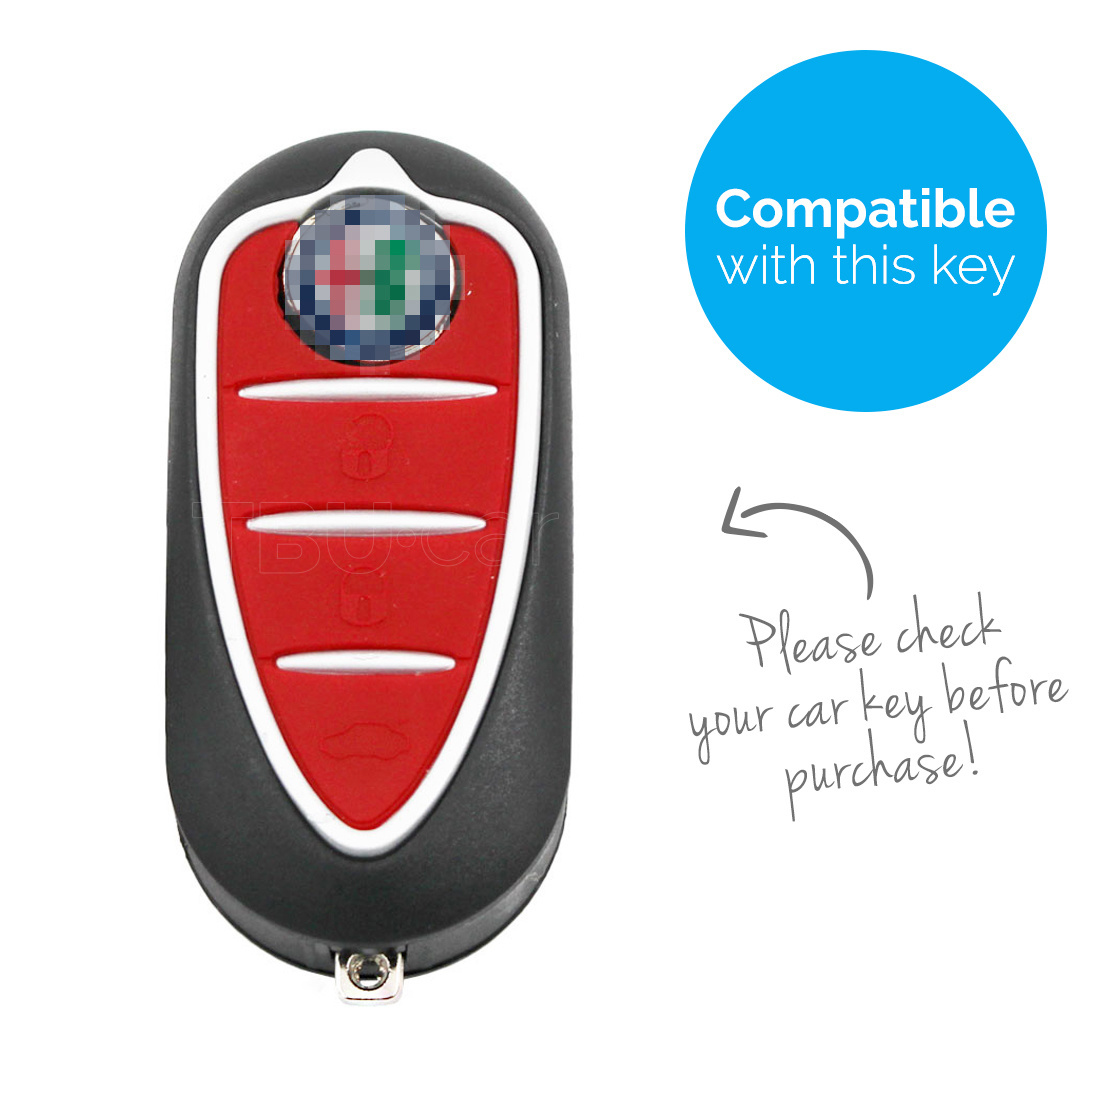 TBU car TBU car Autoschlüssel Hülle kompatibel mit Alfa Romeo 3 Tasten - Schutzhülle aus Silikon - Auto Schlüsselhülle Cover in Weiß